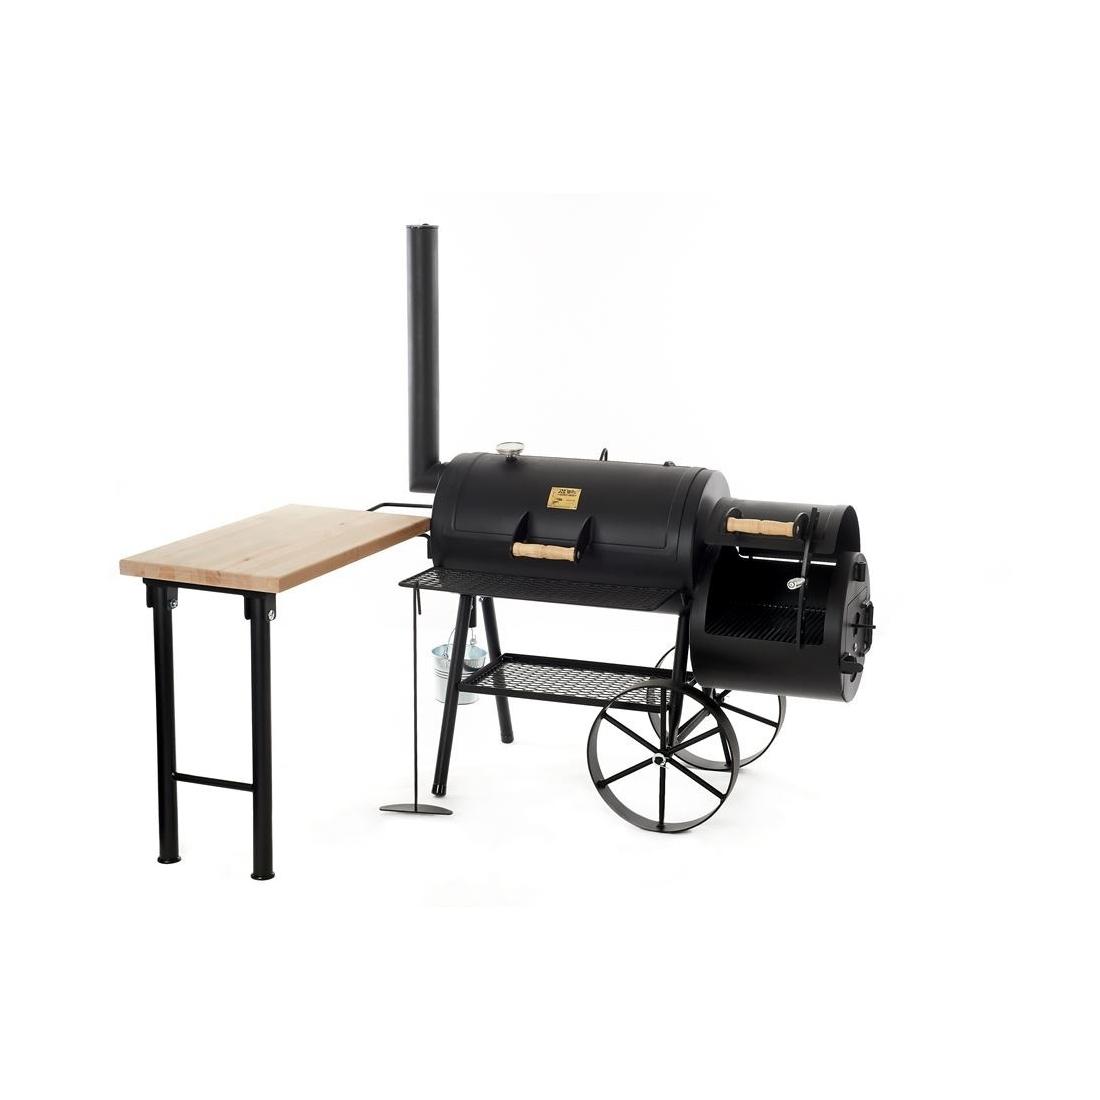 joe s bbq smoker wild west 16 griller shop graz. Black Bedroom Furniture Sets. Home Design Ideas